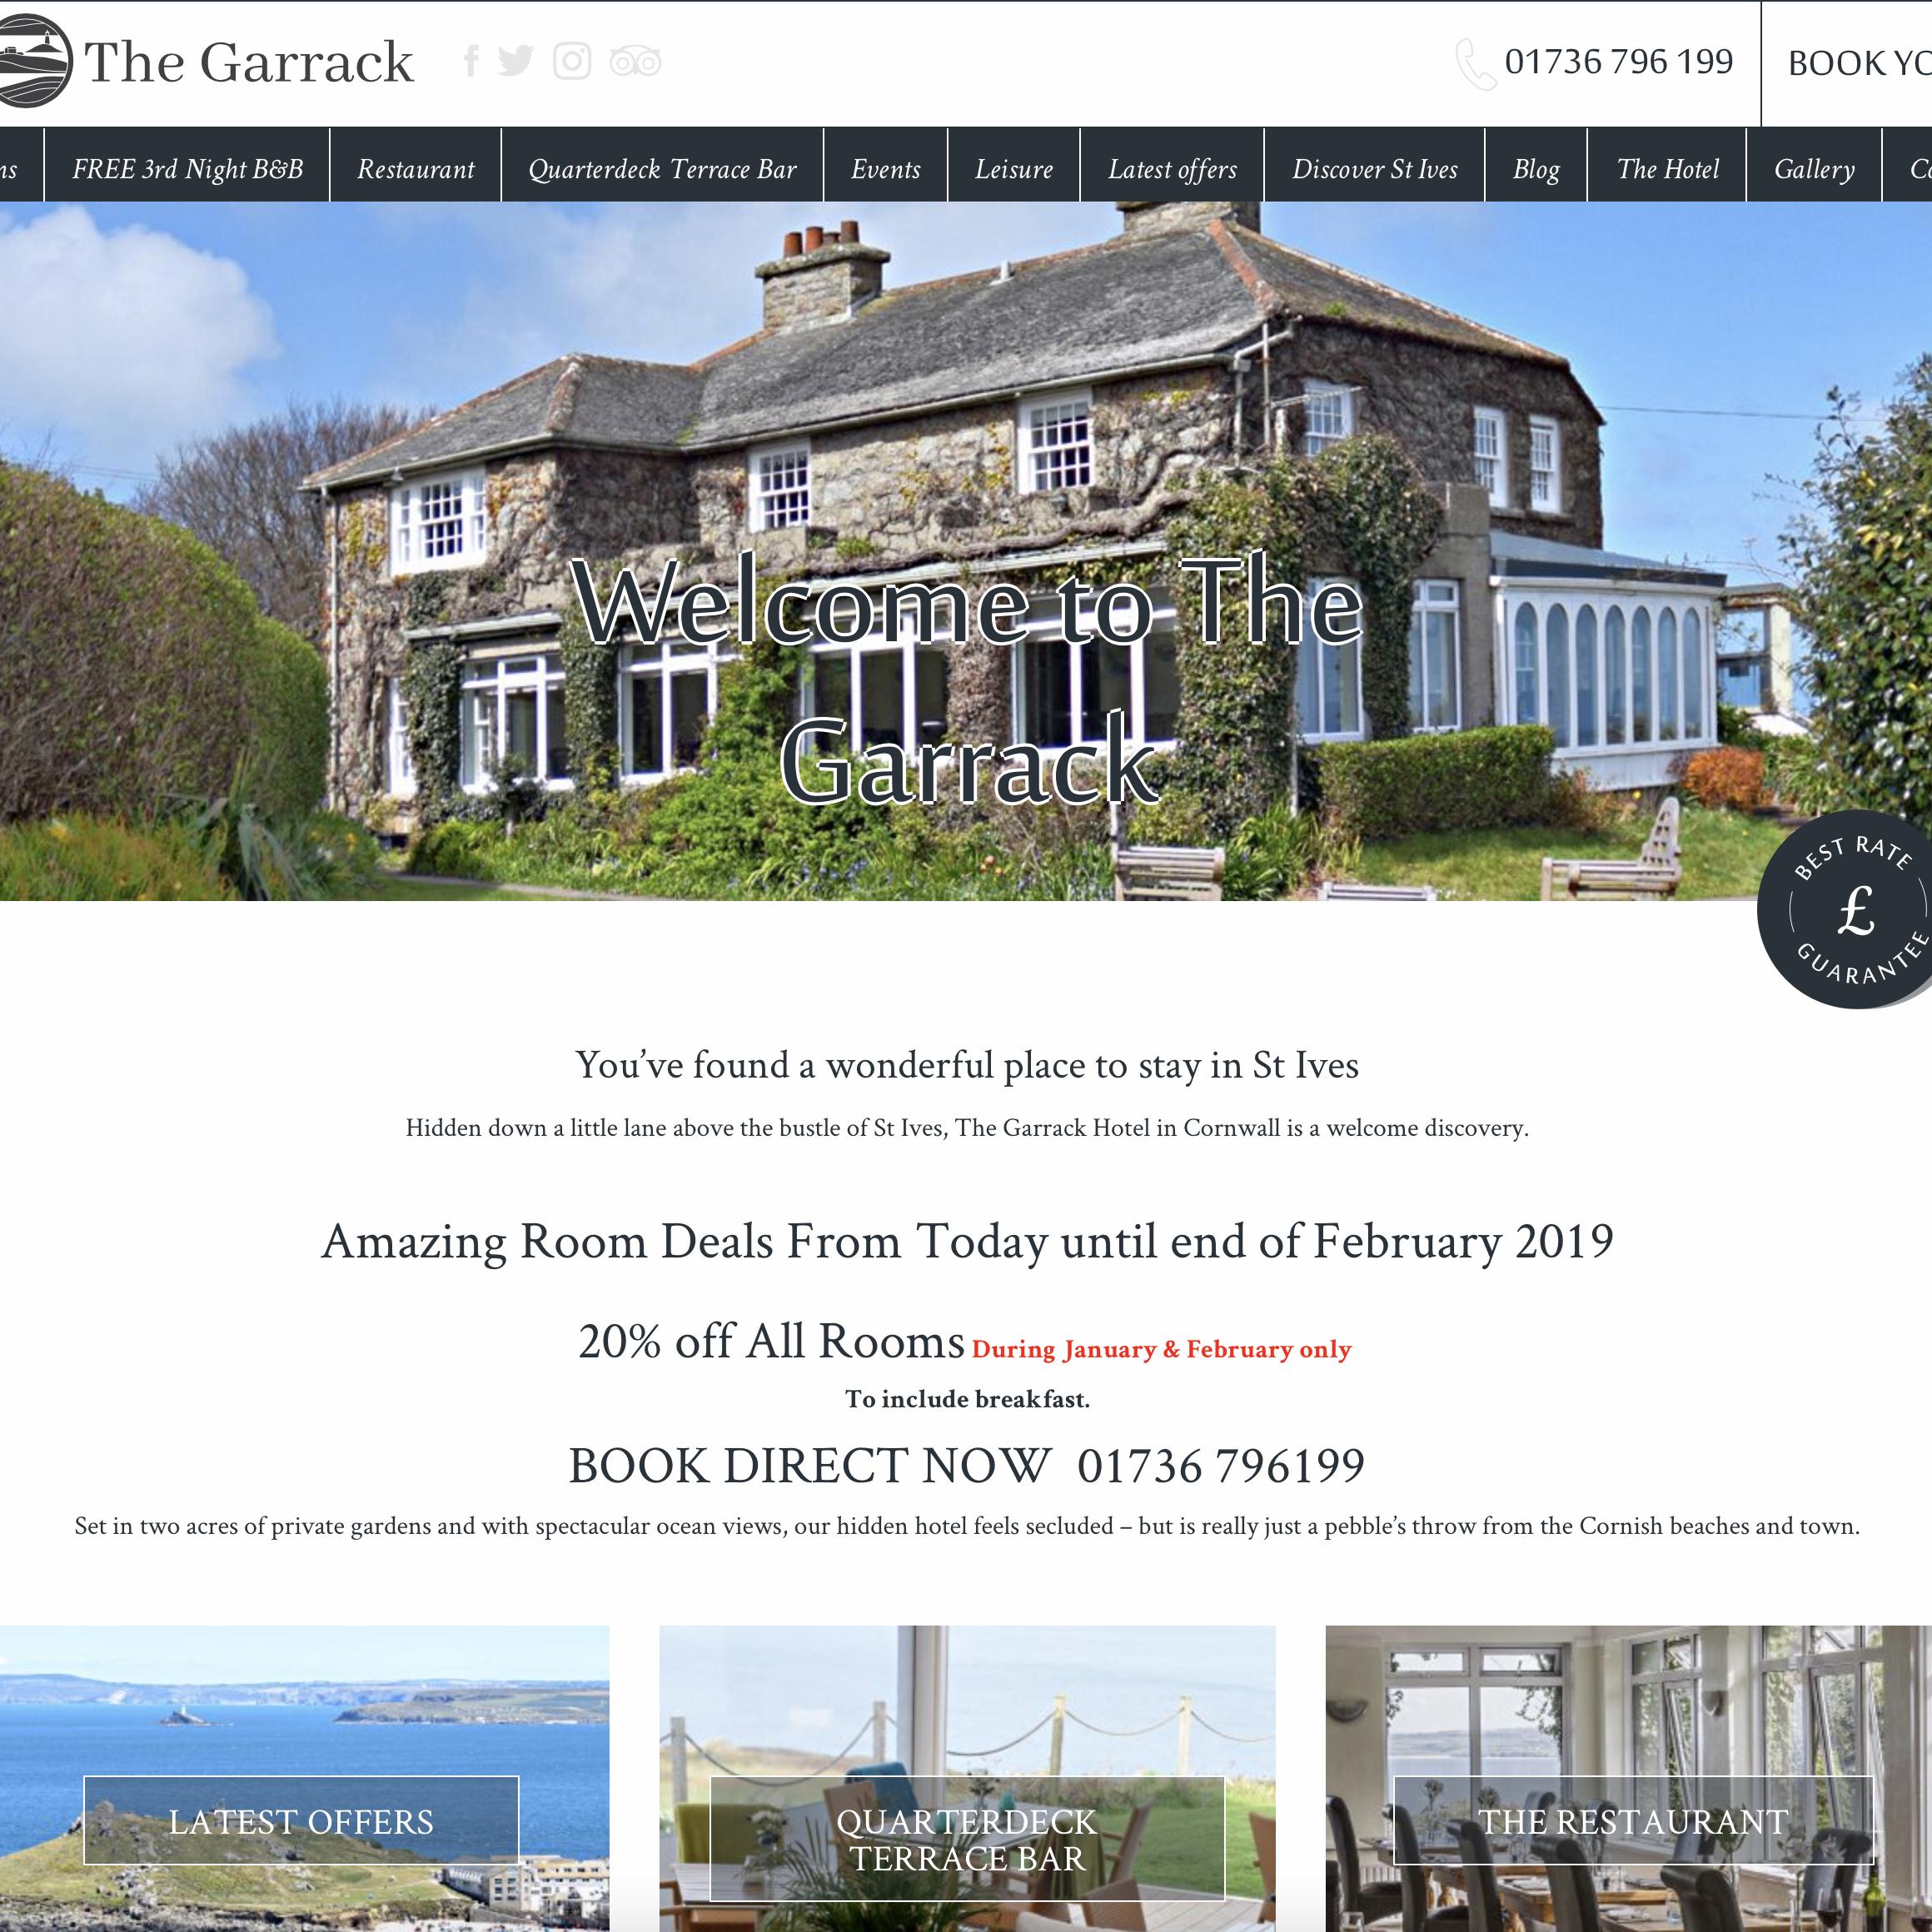 The Garrack Hotel